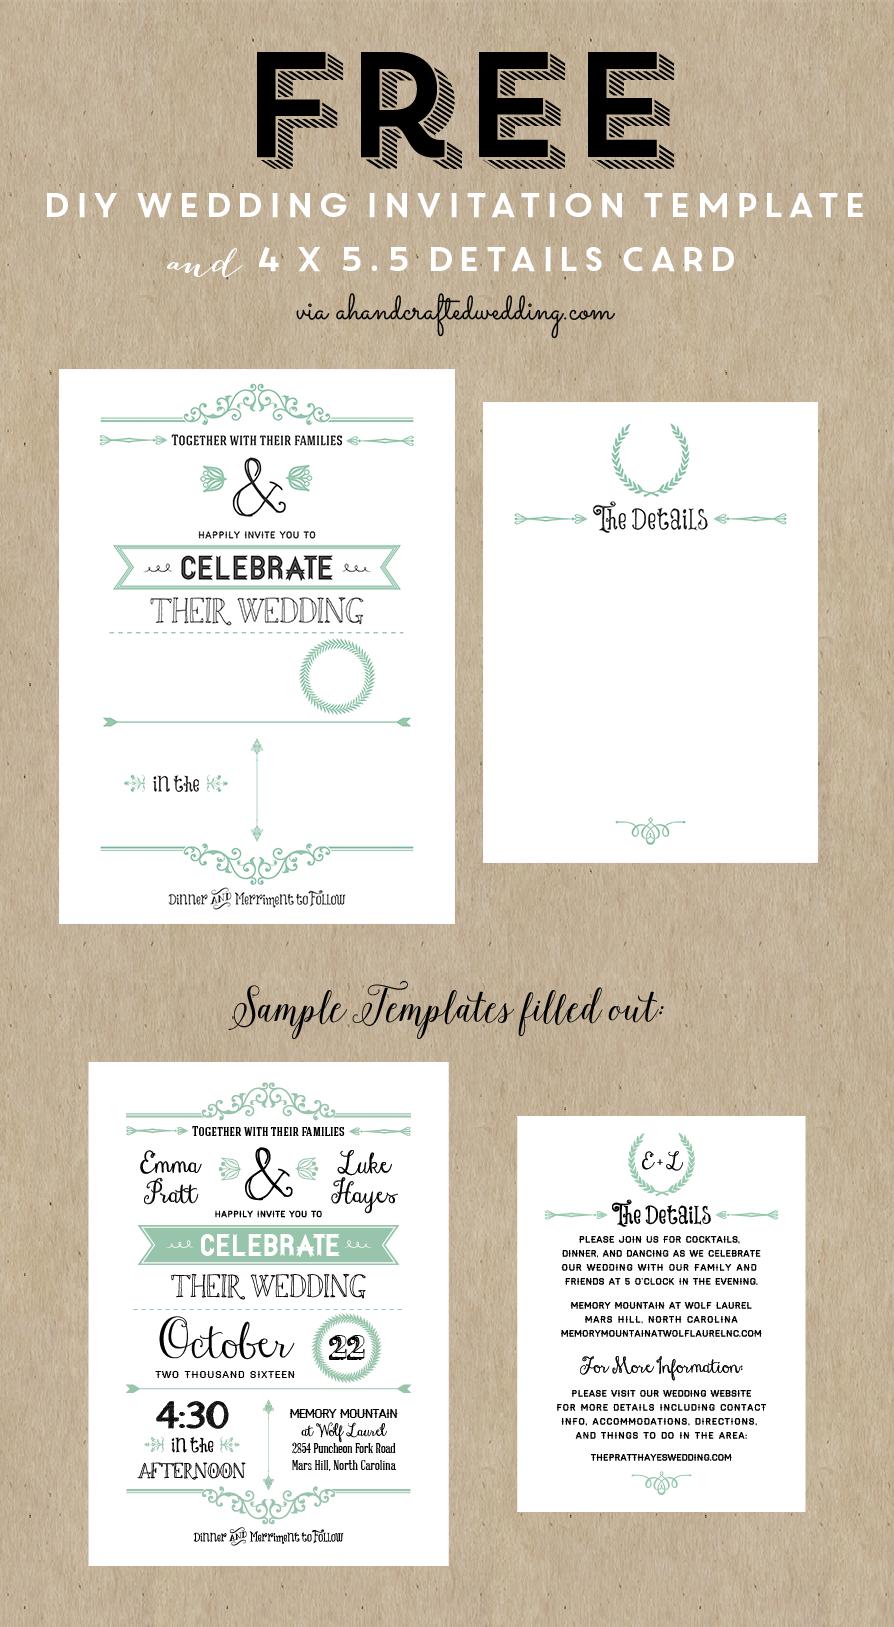 Free Printable Wedding Invitation Template   Wedding   Free Wedding - Free Printable Wedding Invitations